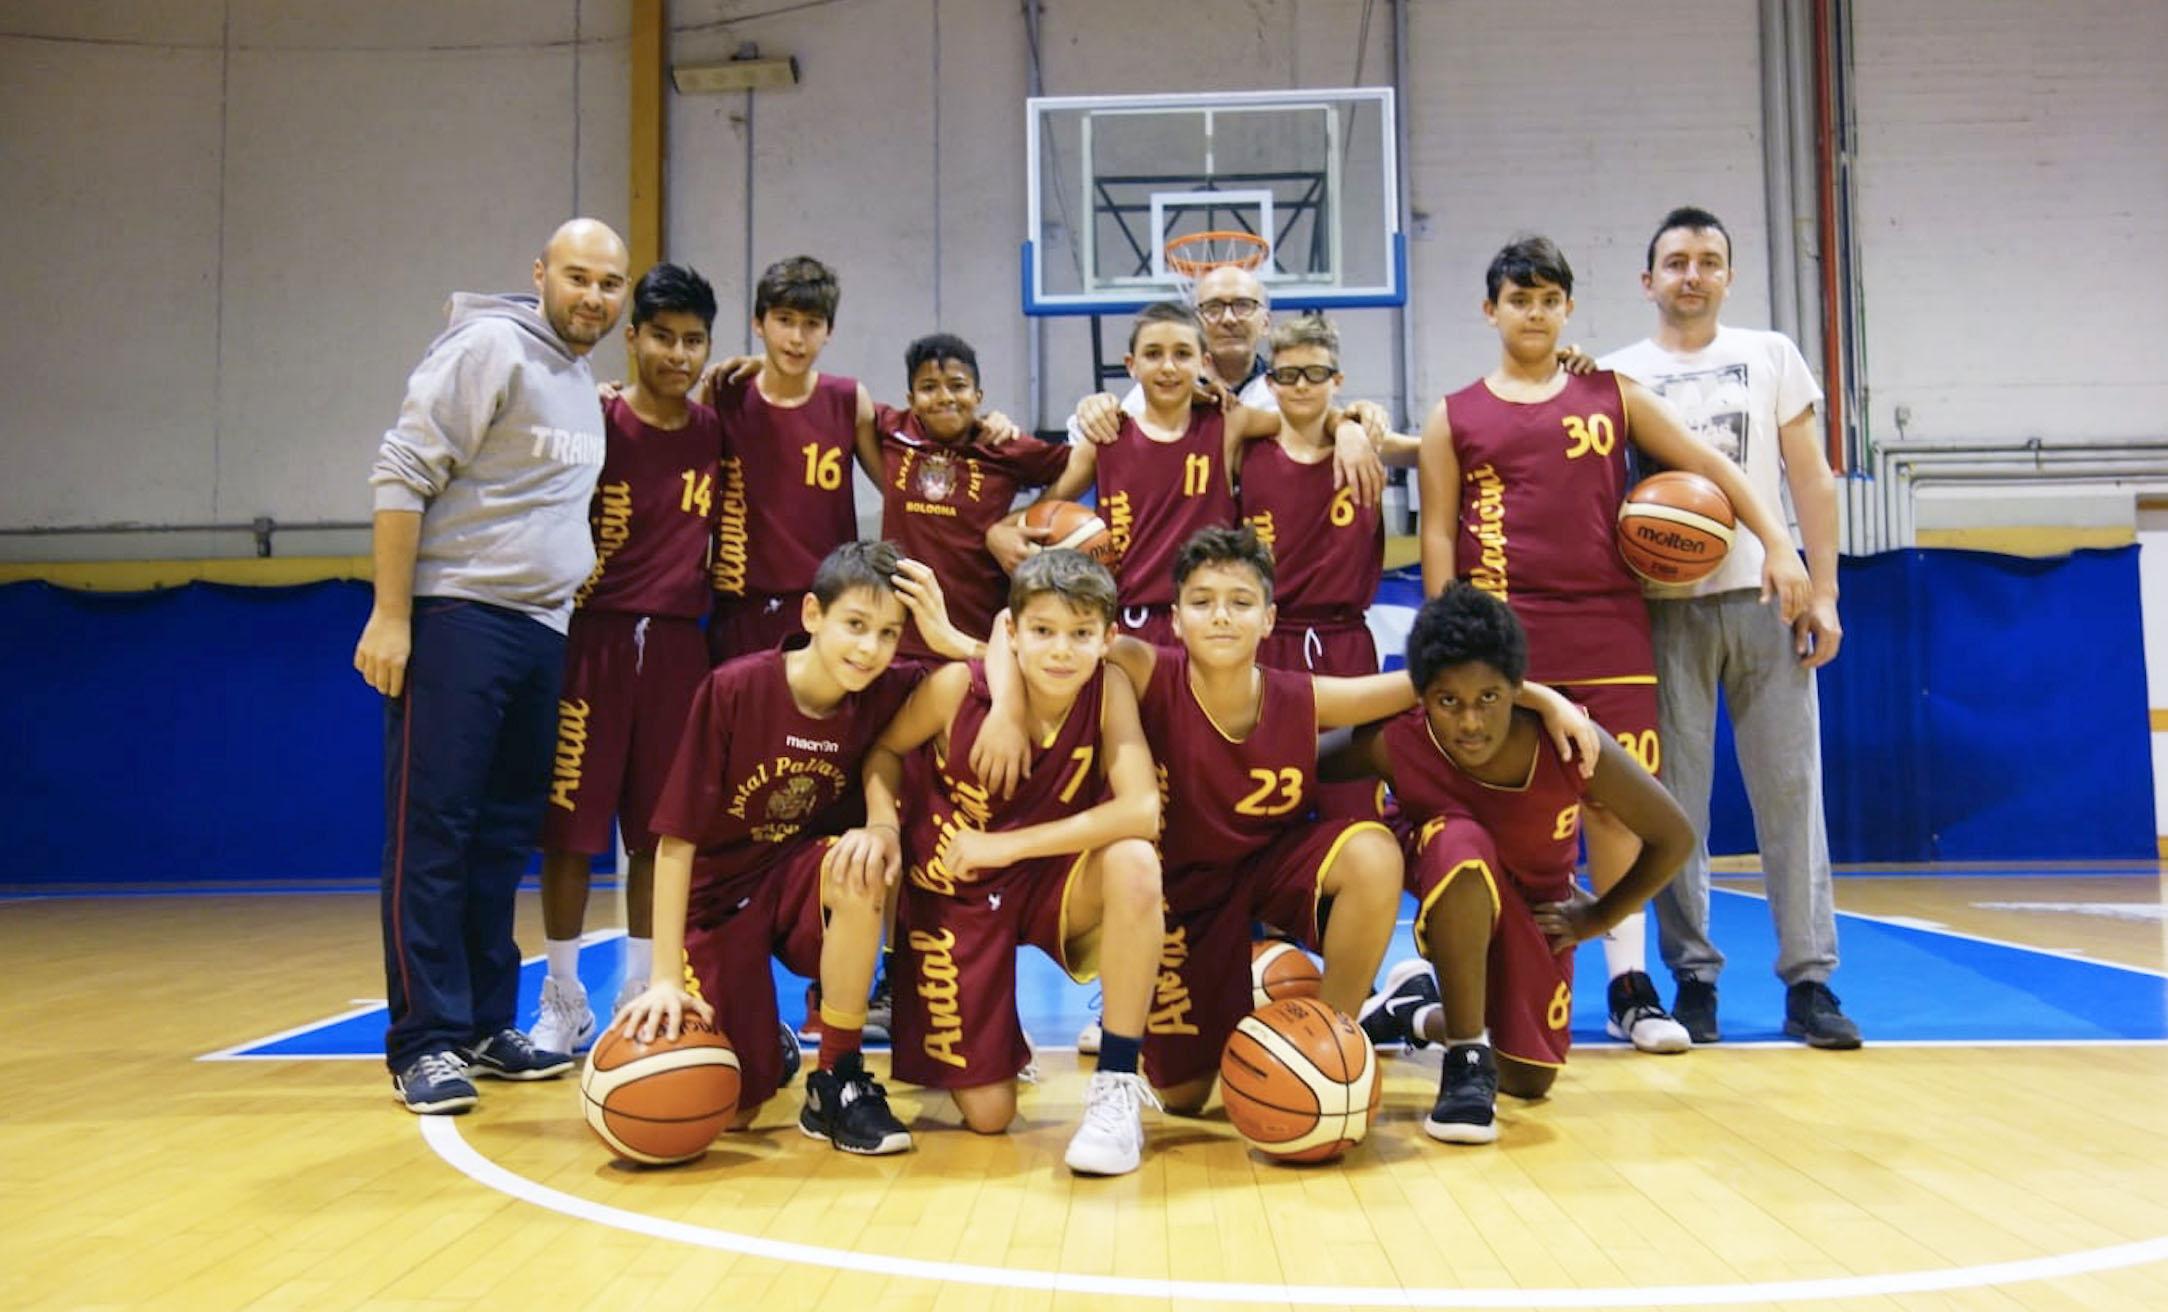 Pallacanestro Under 14 - Antal Pallavicini